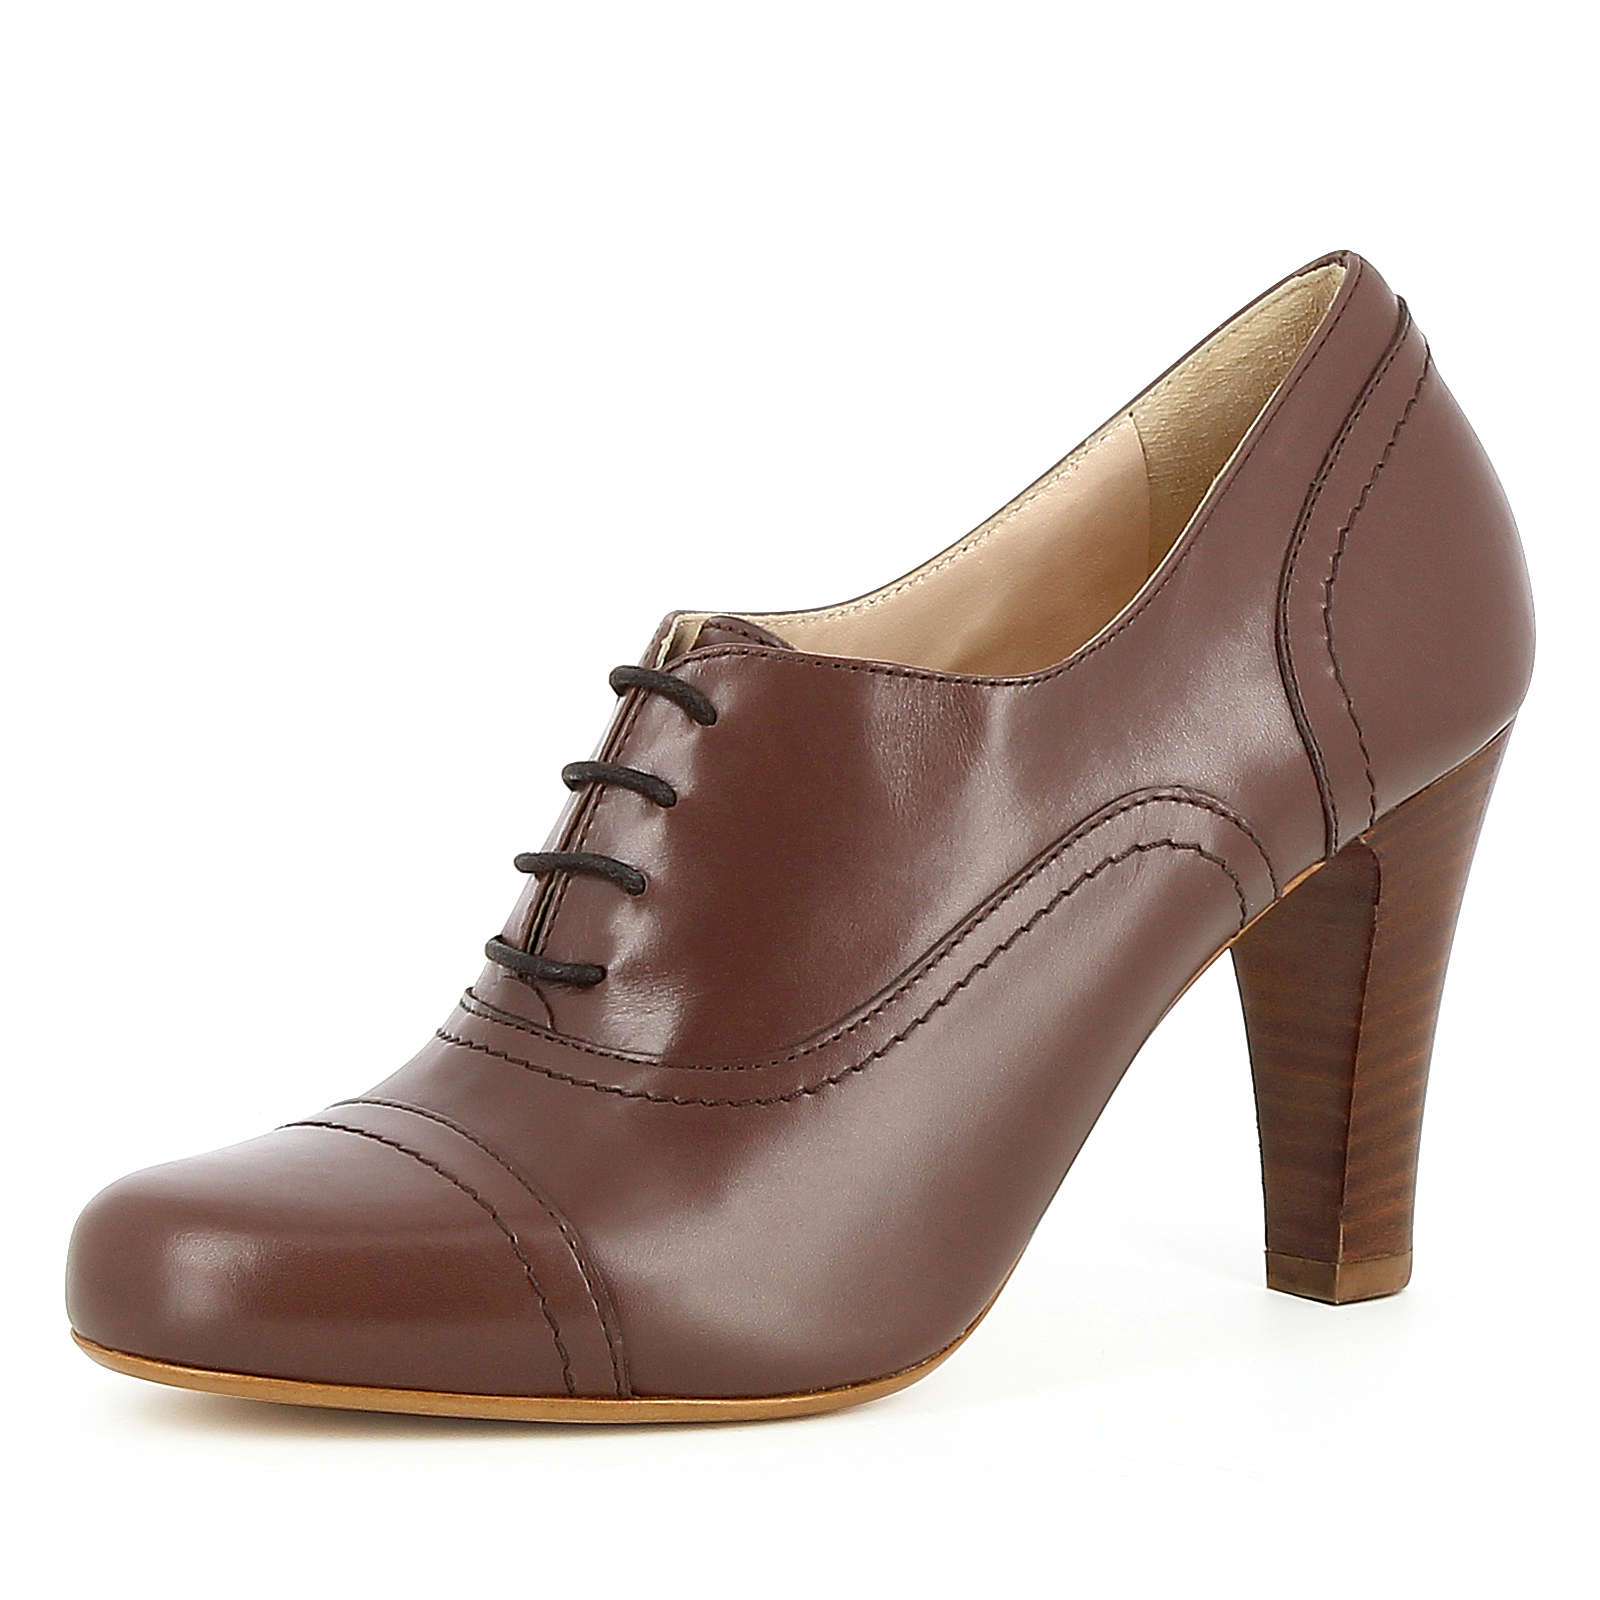 Evita Shoes Damen Pumps MARIA Schnürpumps braun Damen Gr. 37